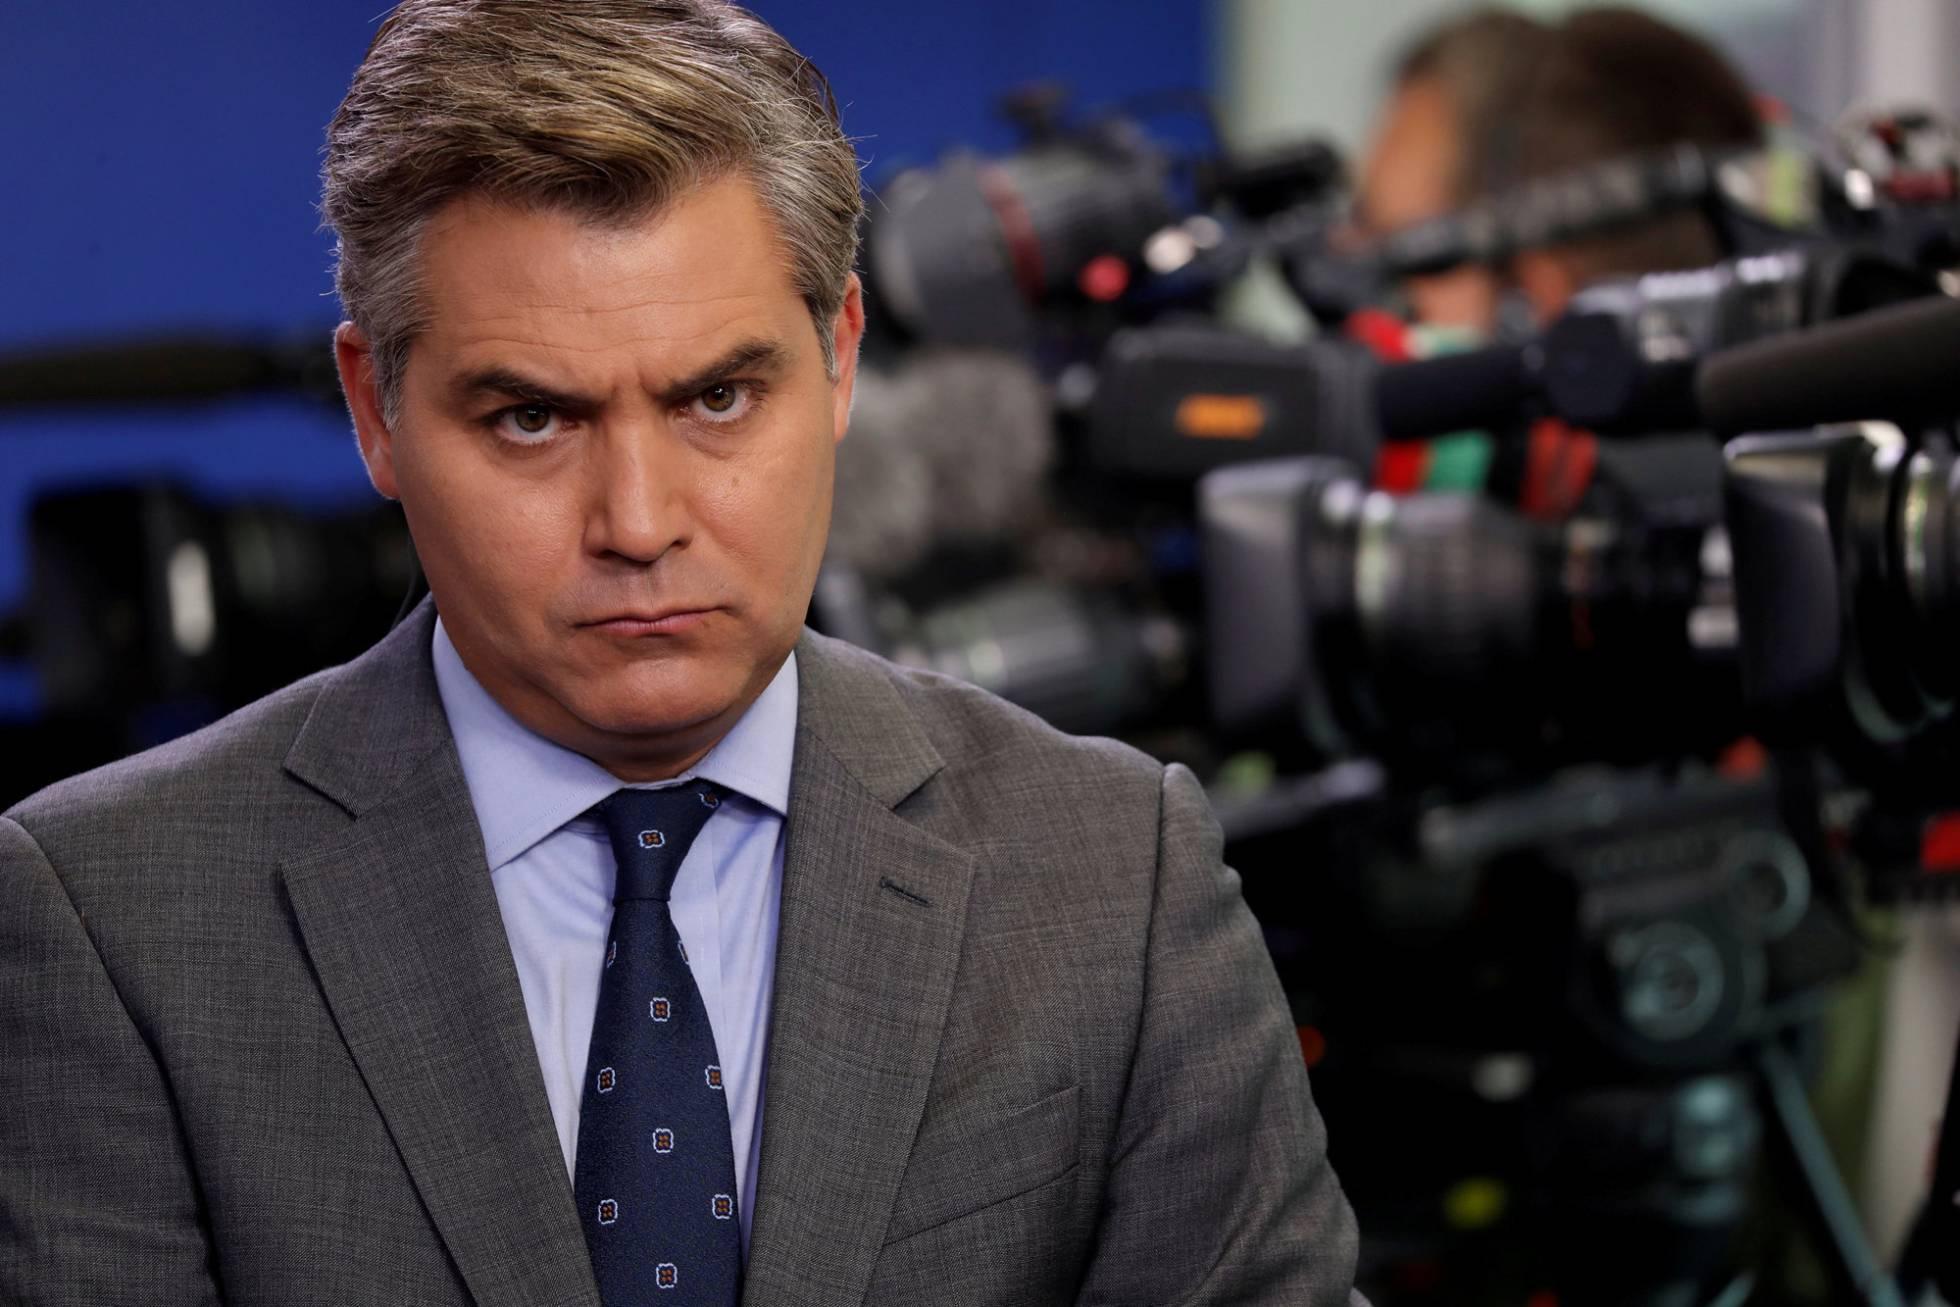 CNN demanda a Trump por la retirada de la credencial al periodista Jim Acosta